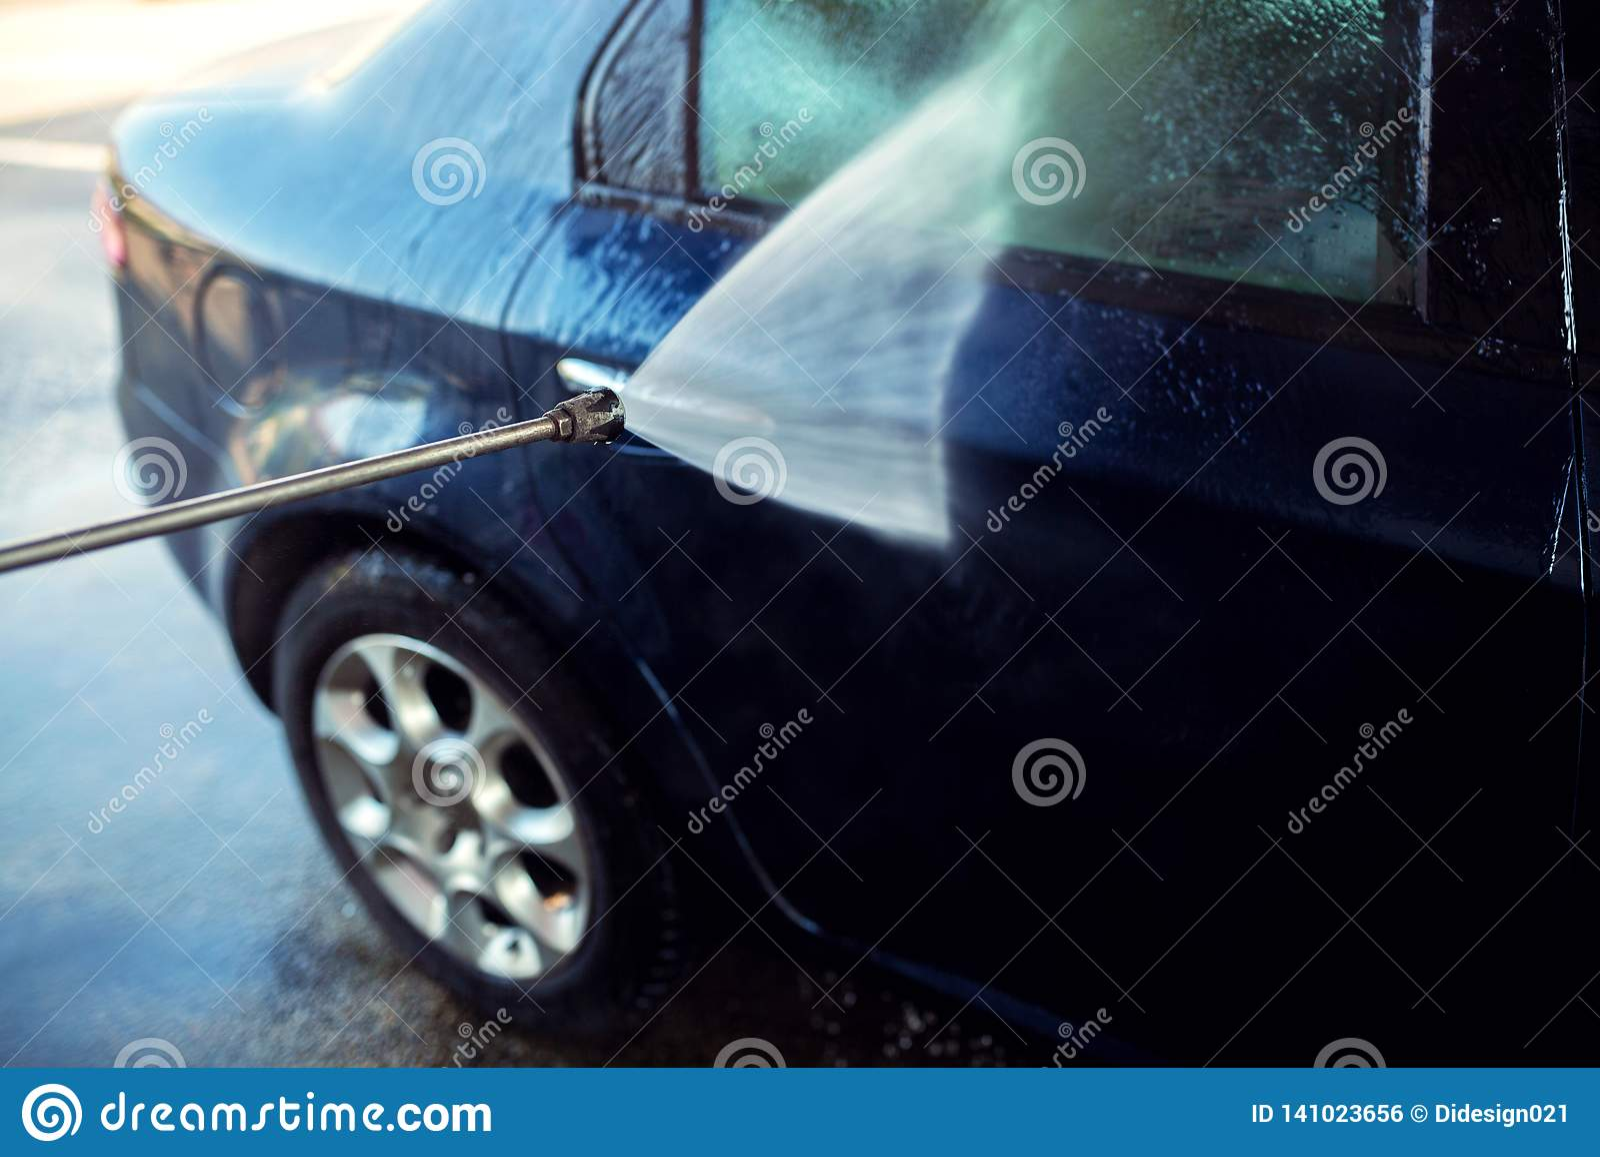 Spray Car Wash >> Car Wash Spray Gun Gets Your Car Clean In No Time Stock